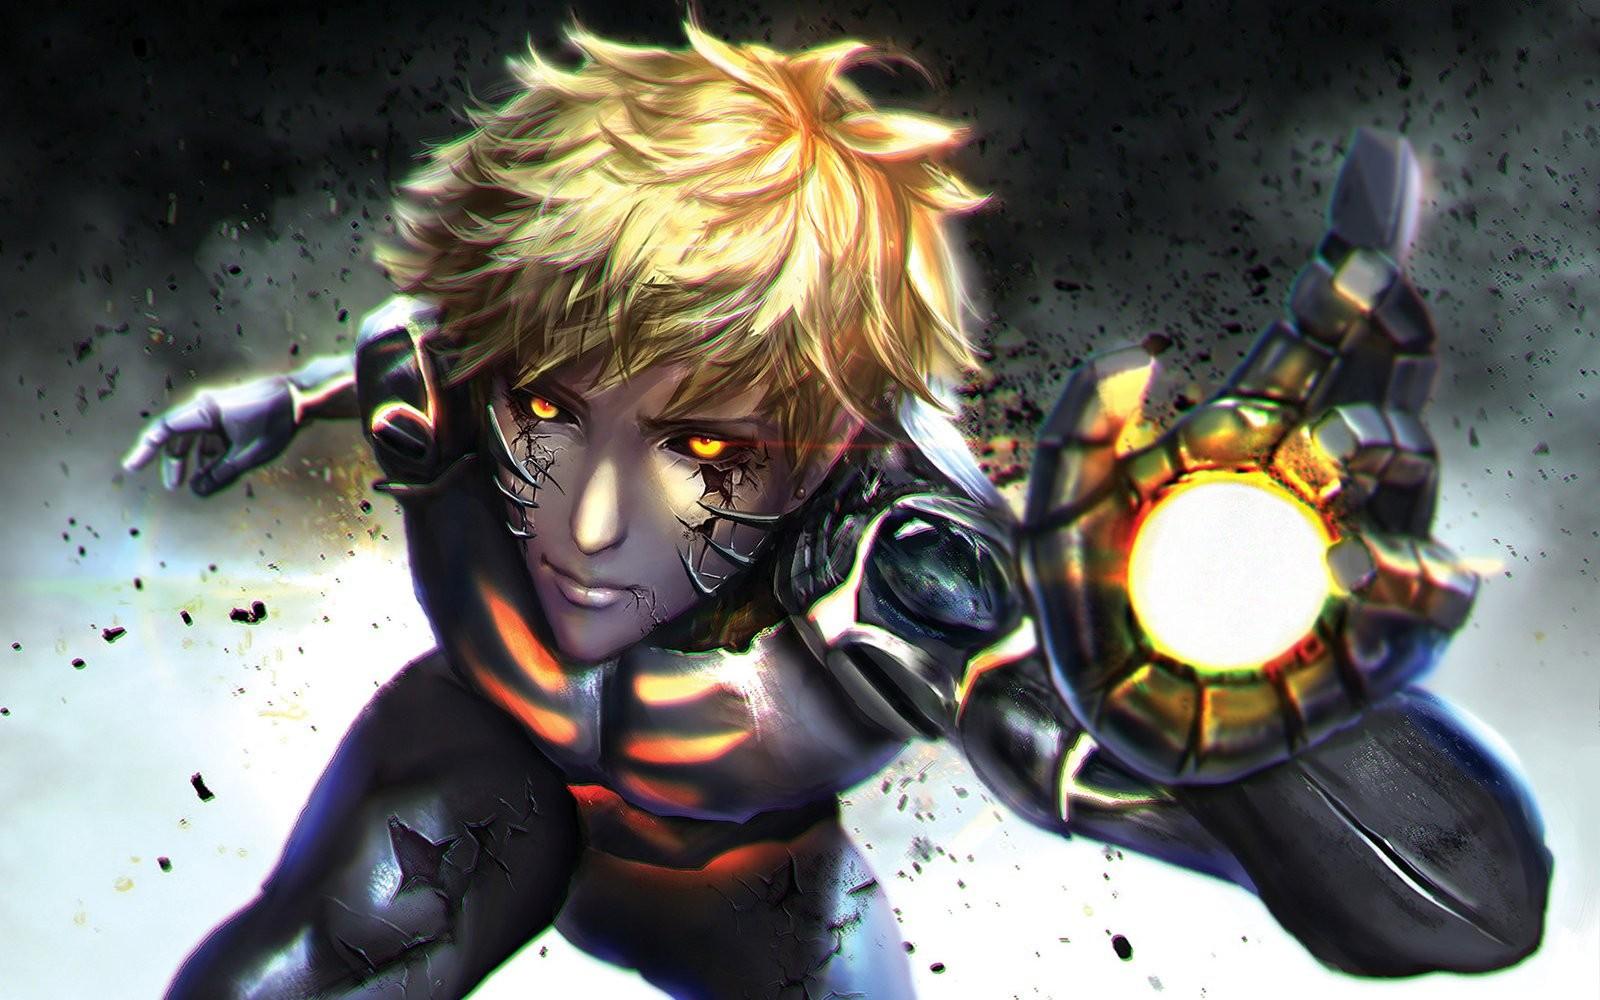 wallpaper blonde anime robot short hair one punch man comics